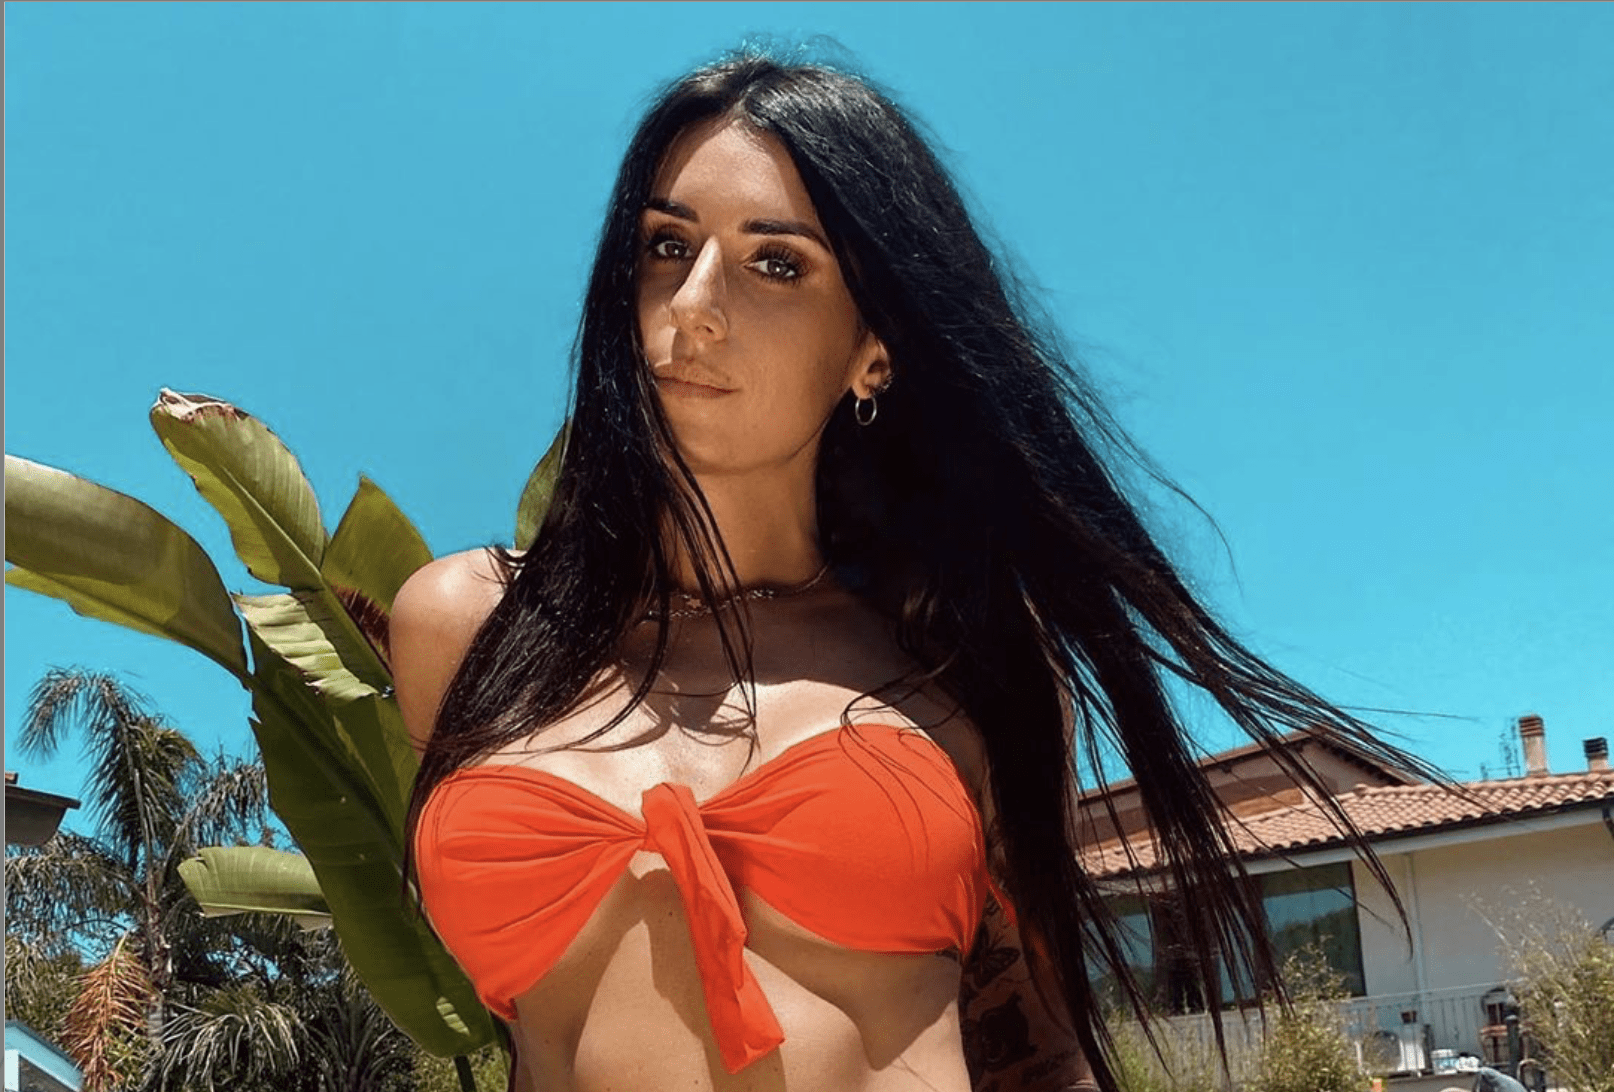 Valentina Vignali bikini, passeggiata sexy a bordo piscina e